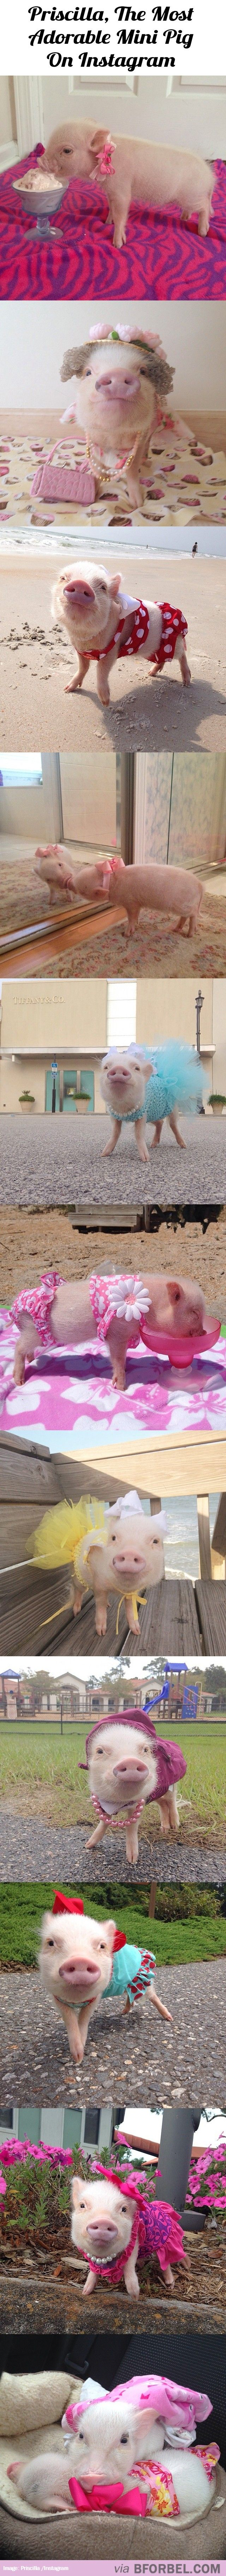 Meet Priscilla, The Most Adorable Mini Pig On Instagram…